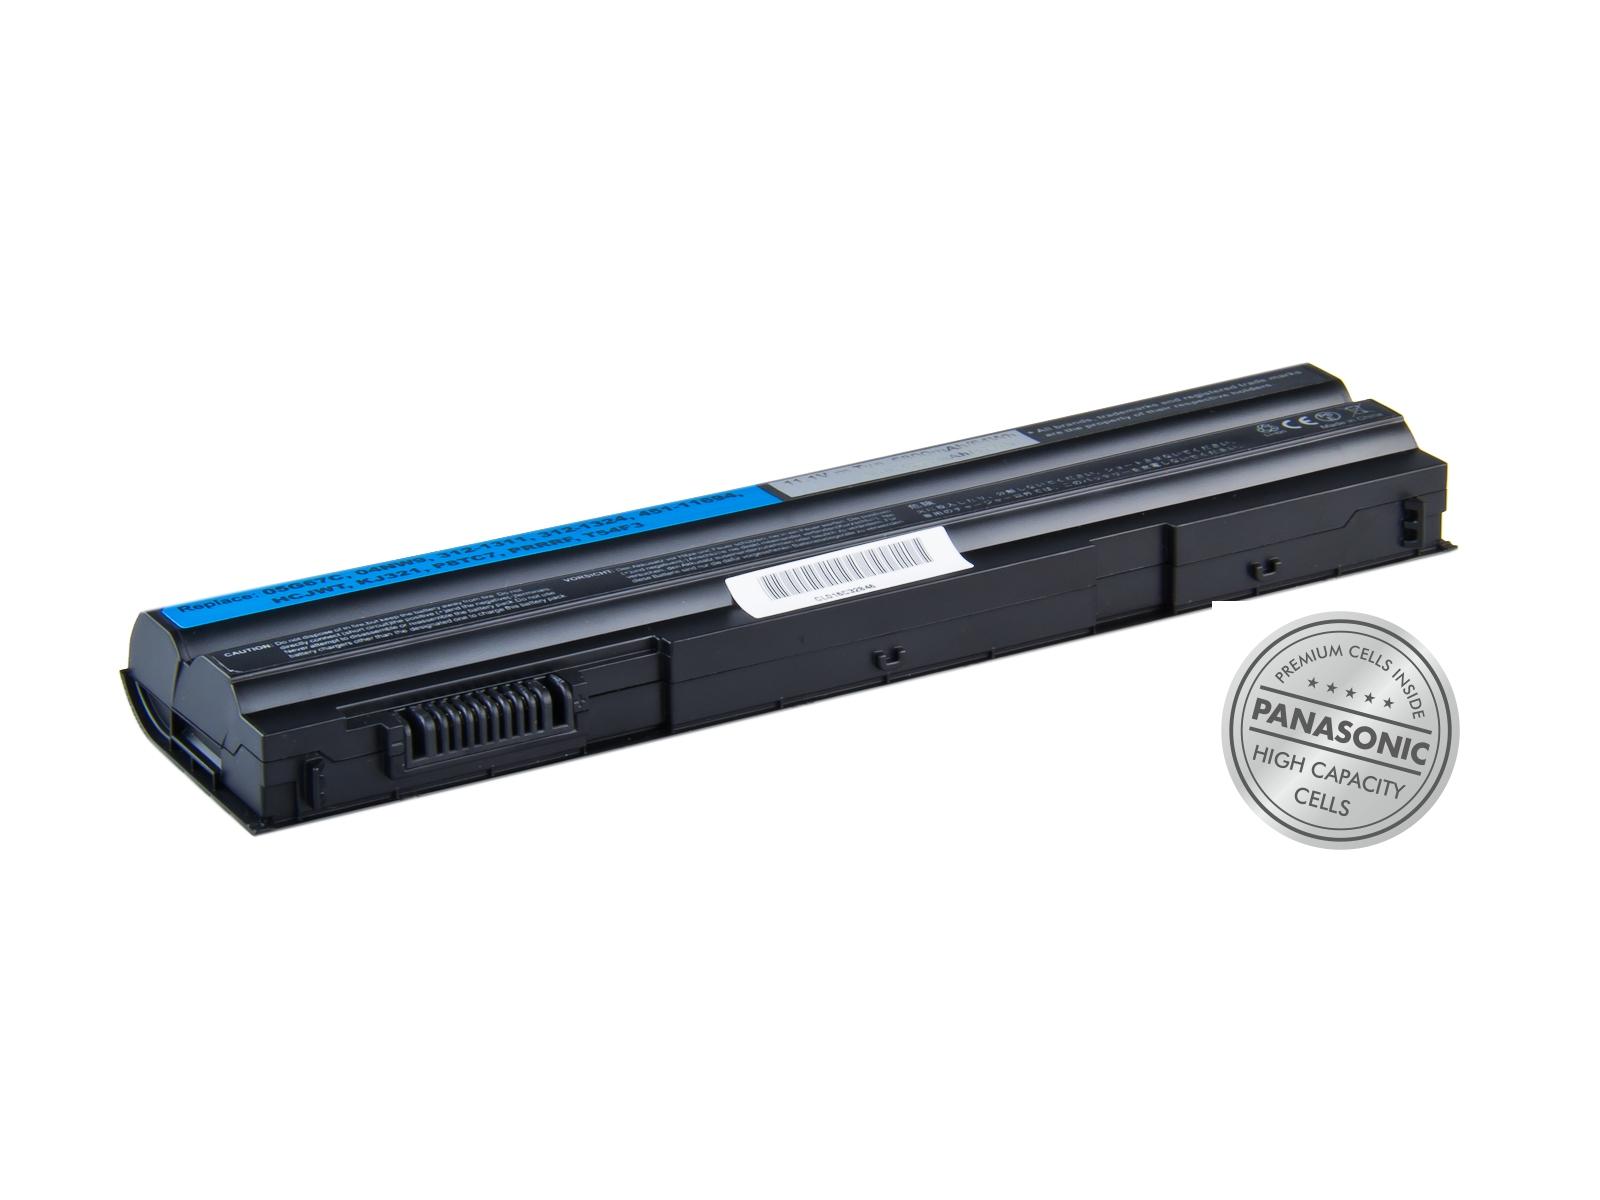 Baterie AVACOM NODE-E20N-P29 pro Dell Latitude E5420, E5530, Inspiron 15R, Li-Ion 11,1V 5800mAh